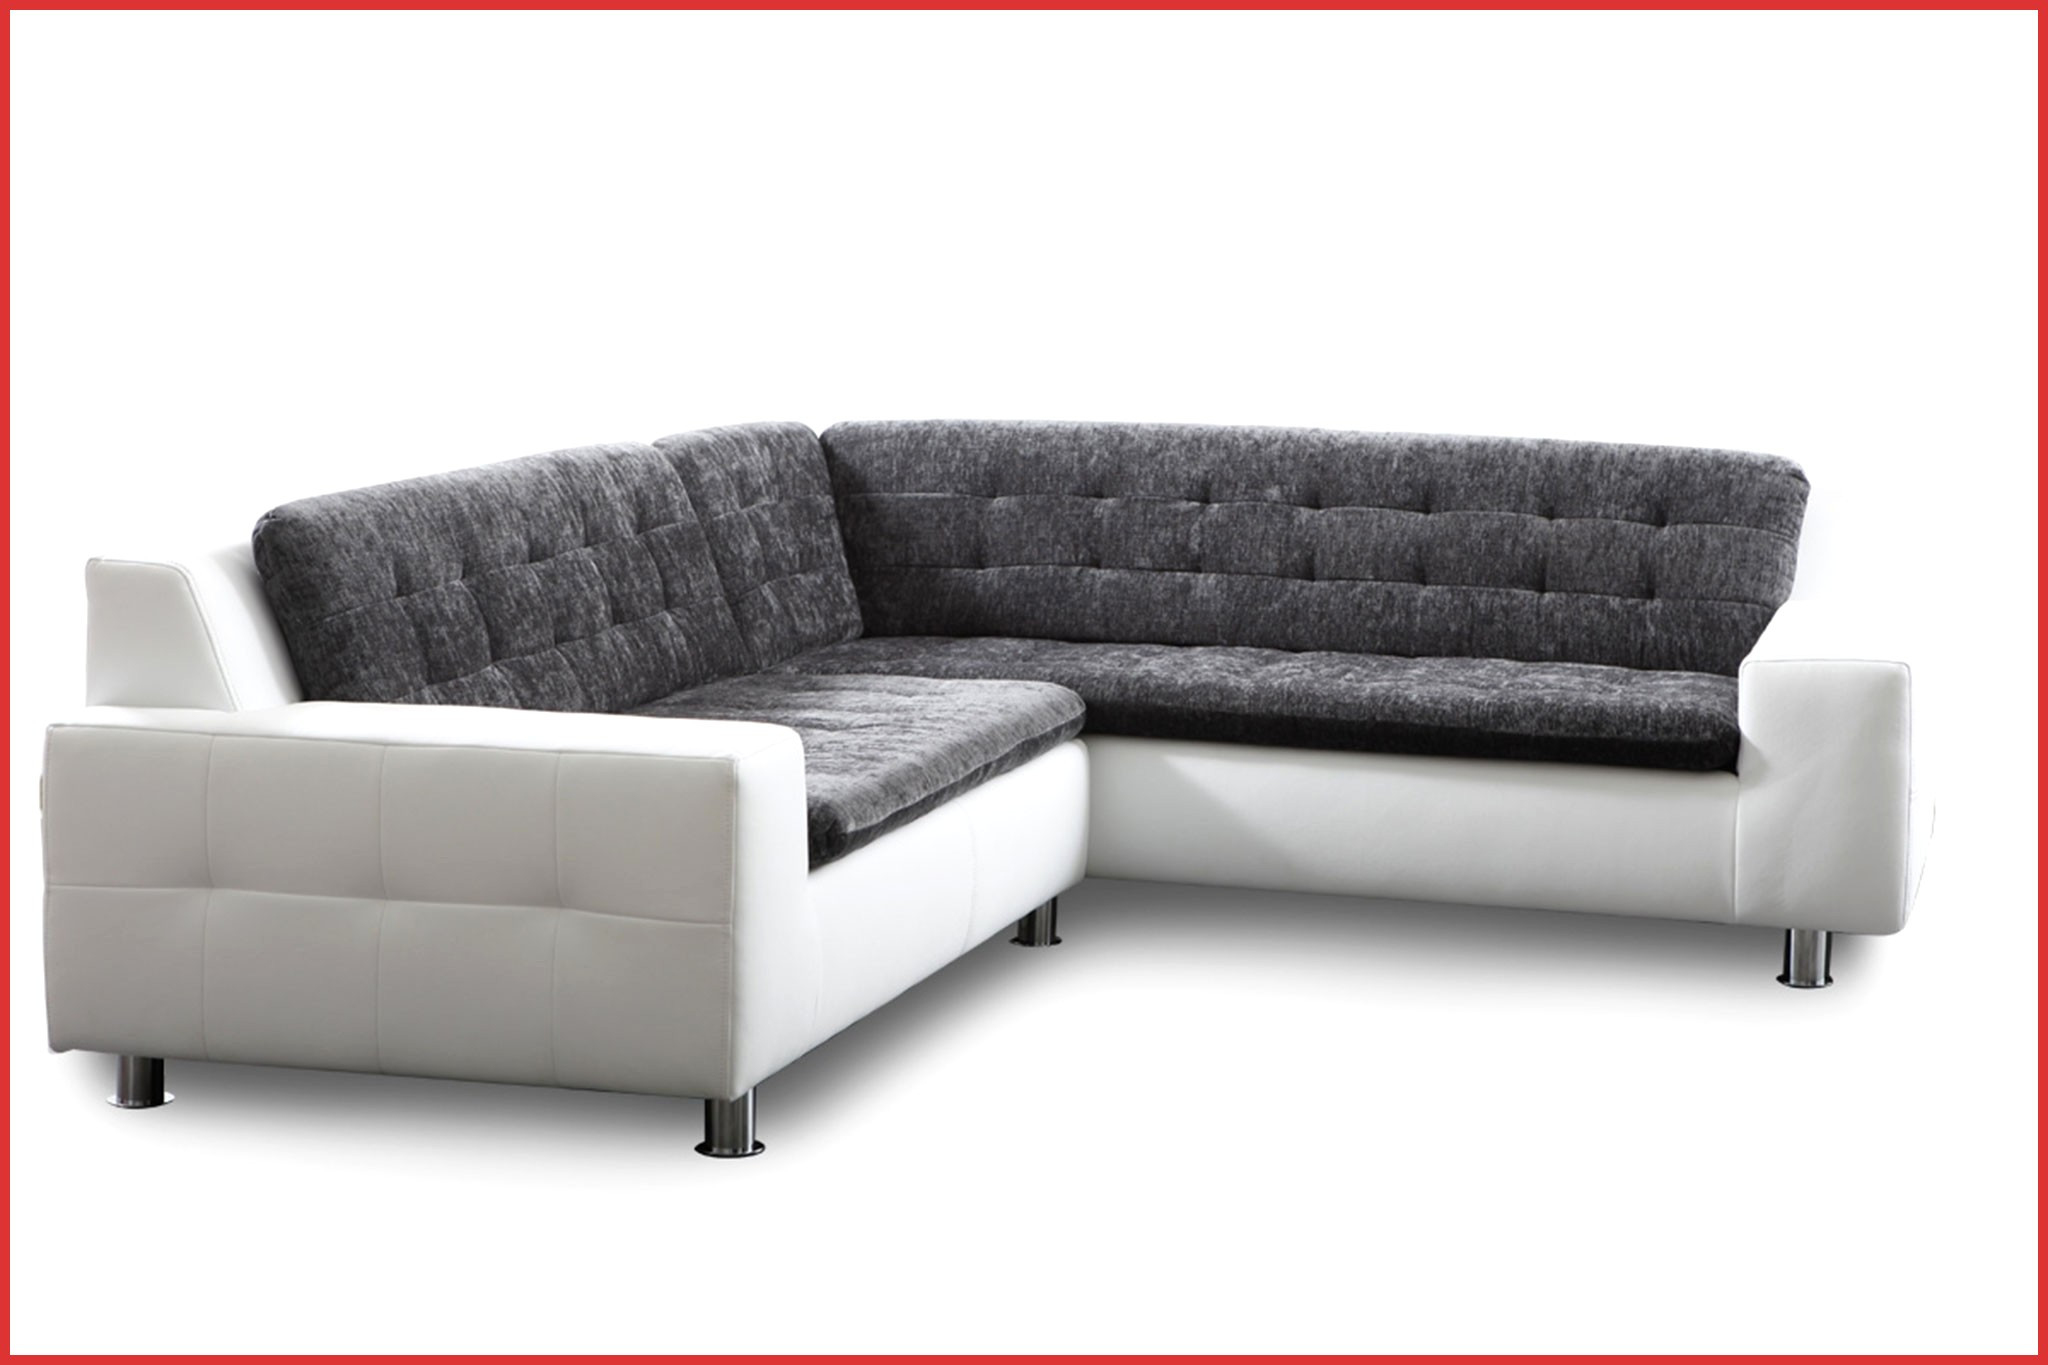 Ikea Canapé Convertible Angle Frais Galerie Canap Convertible 3 Places Conforama 33 Canape Marina Luxe Lit 28